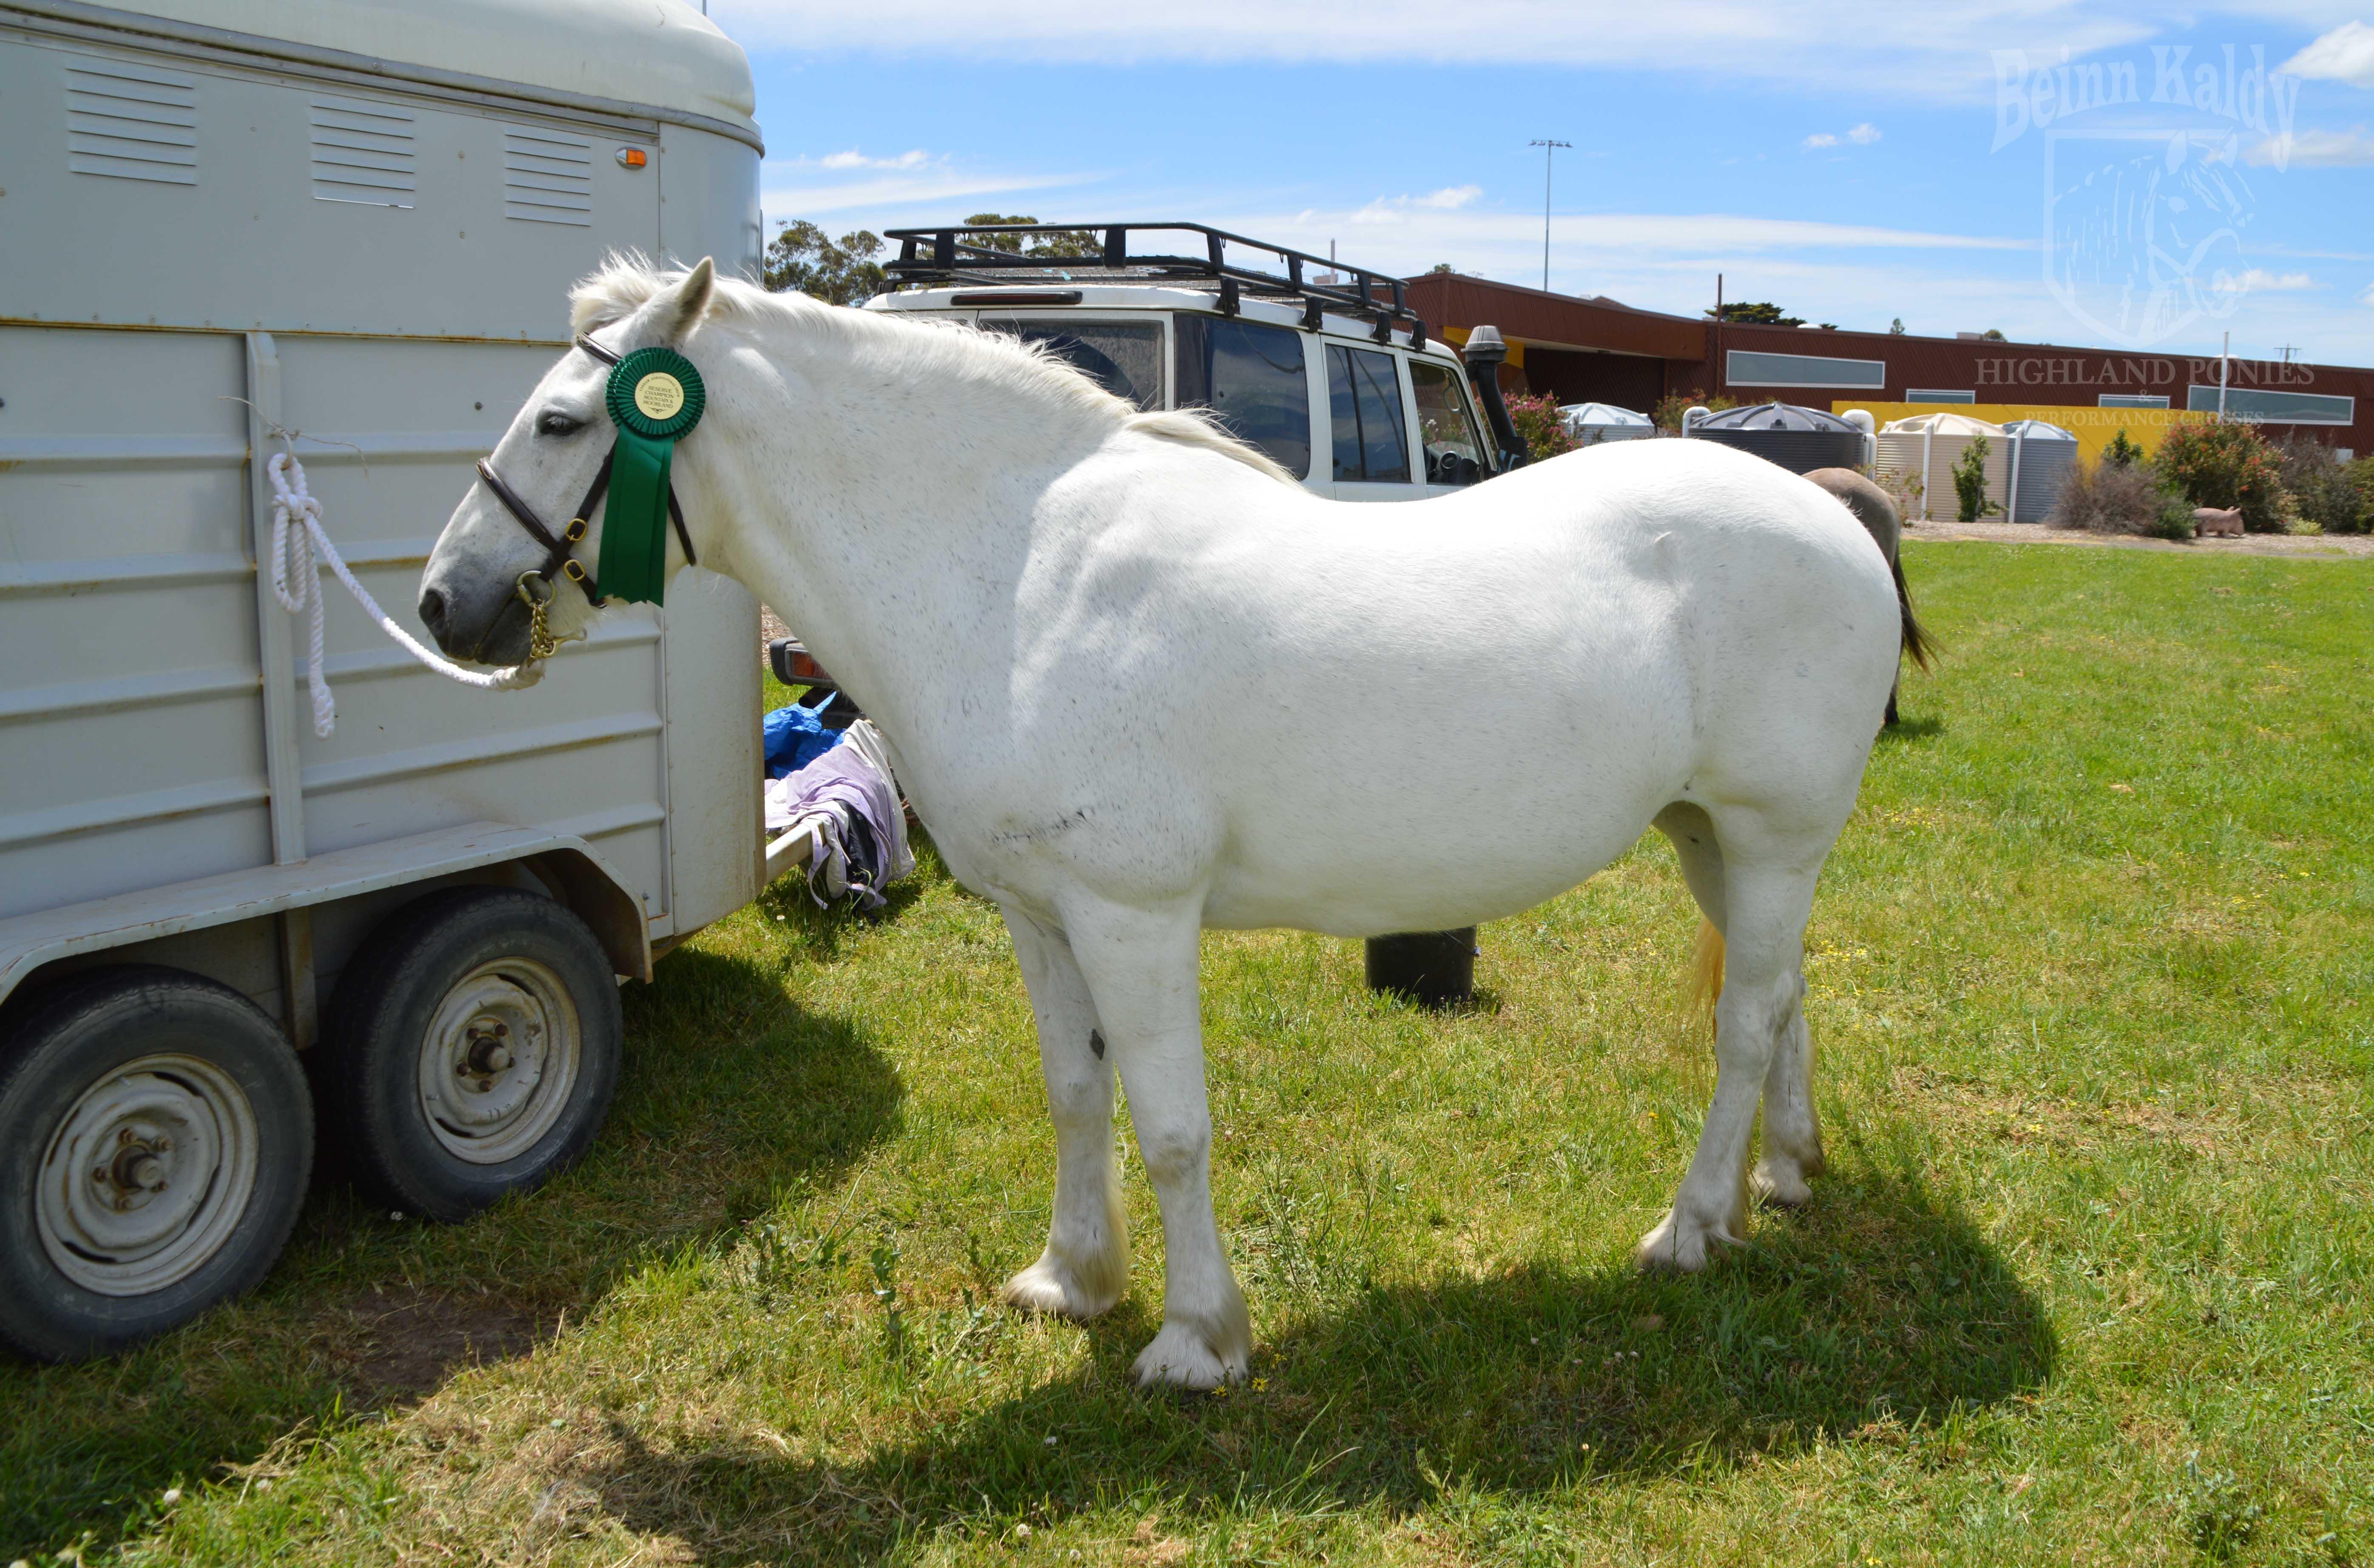 beinn kaldy, highland pony mare, senlac